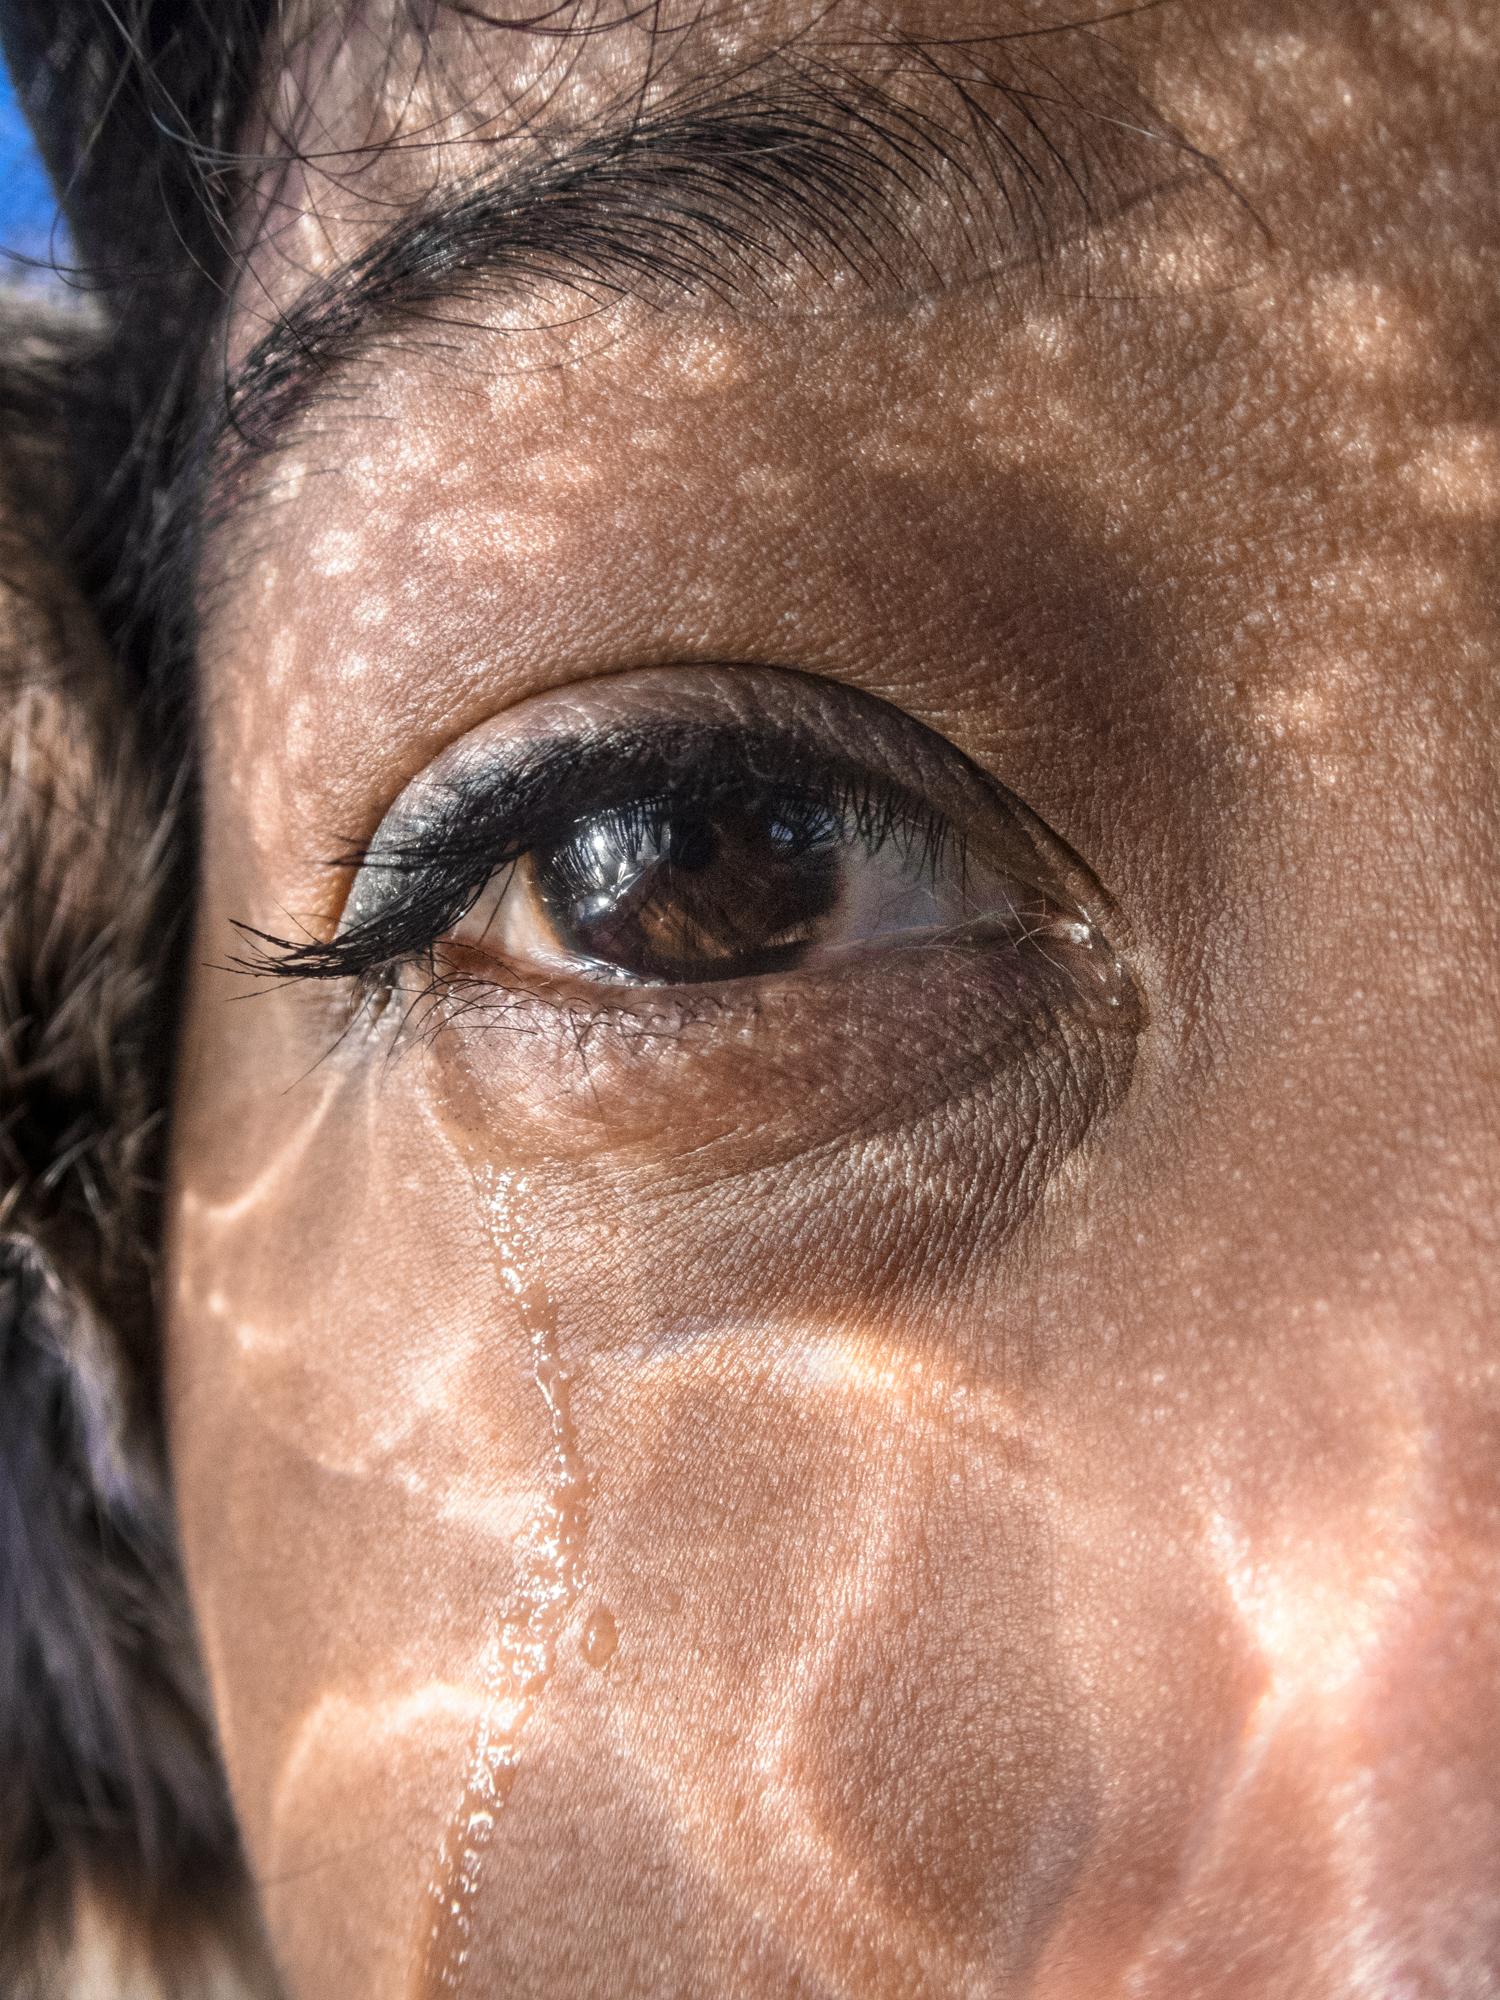 Deka's eye (2019) - 20 x 15 pulgadas- Edición de 5 + 2 P/A, Impresión Inkjet / Inkjet print